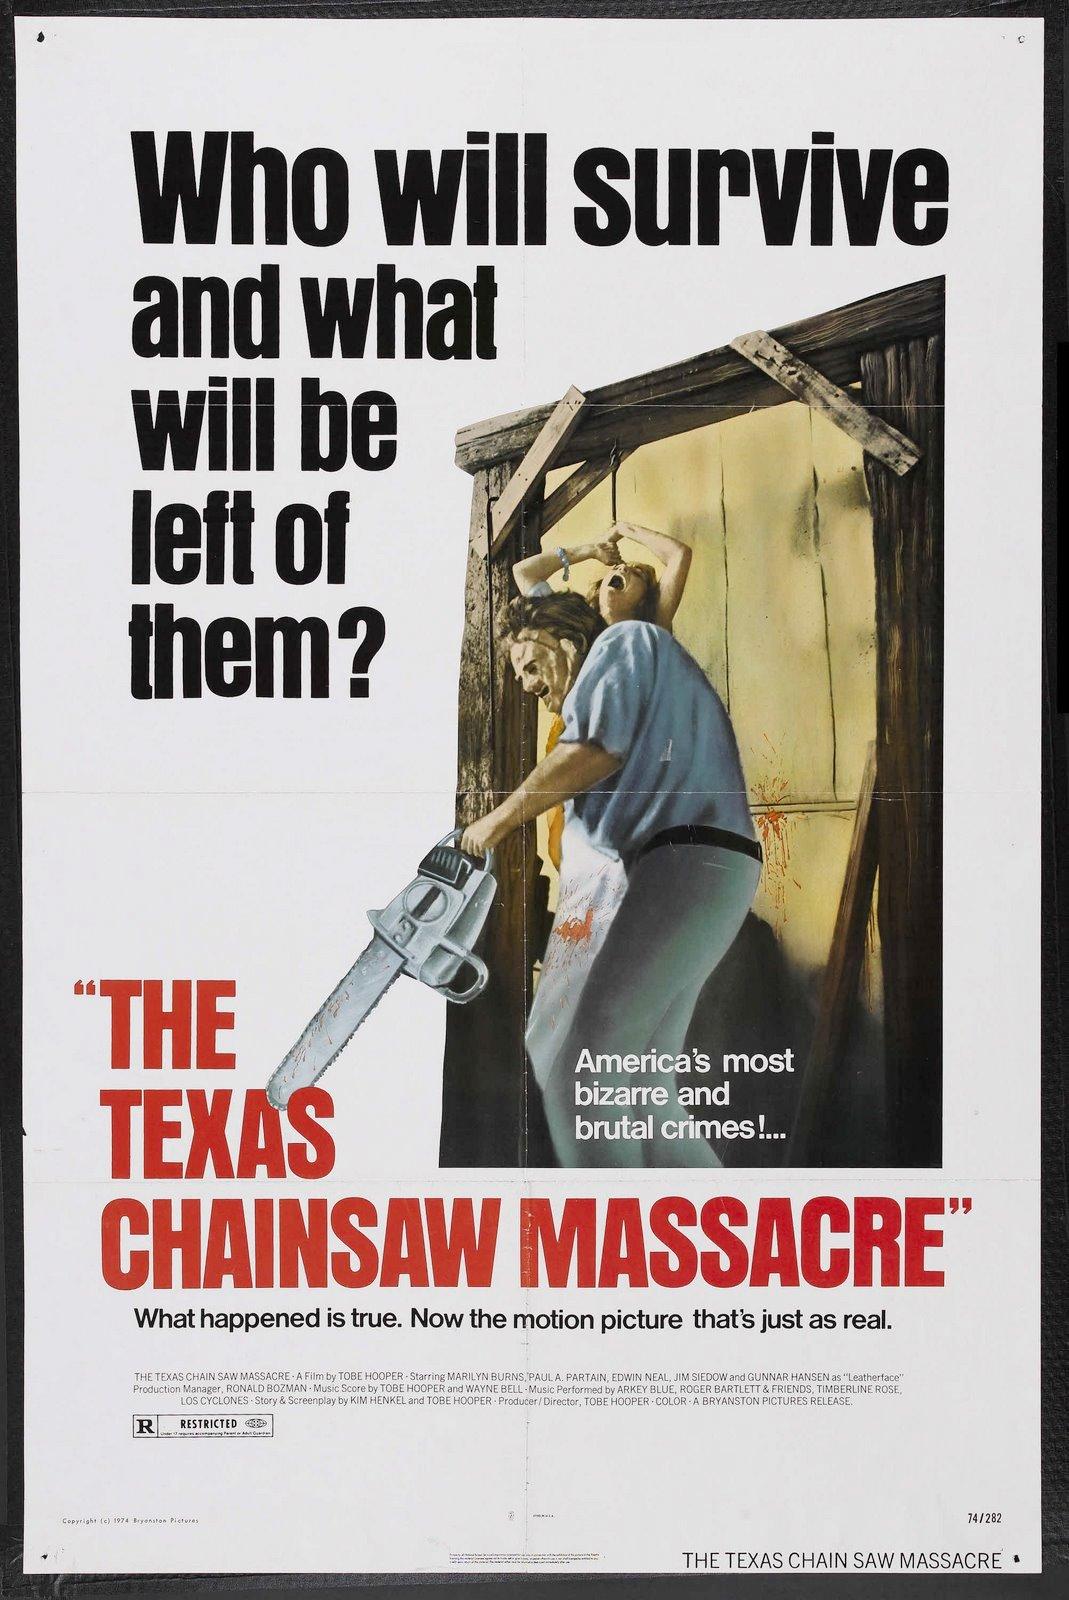 http://3.bp.blogspot.com/-II3IVqCfziM/TZvGunoOoBI/AAAAAAAAB04/XvC_1t33IlI/s1600/texas_chainsaw_massacre_poster_03.jpg